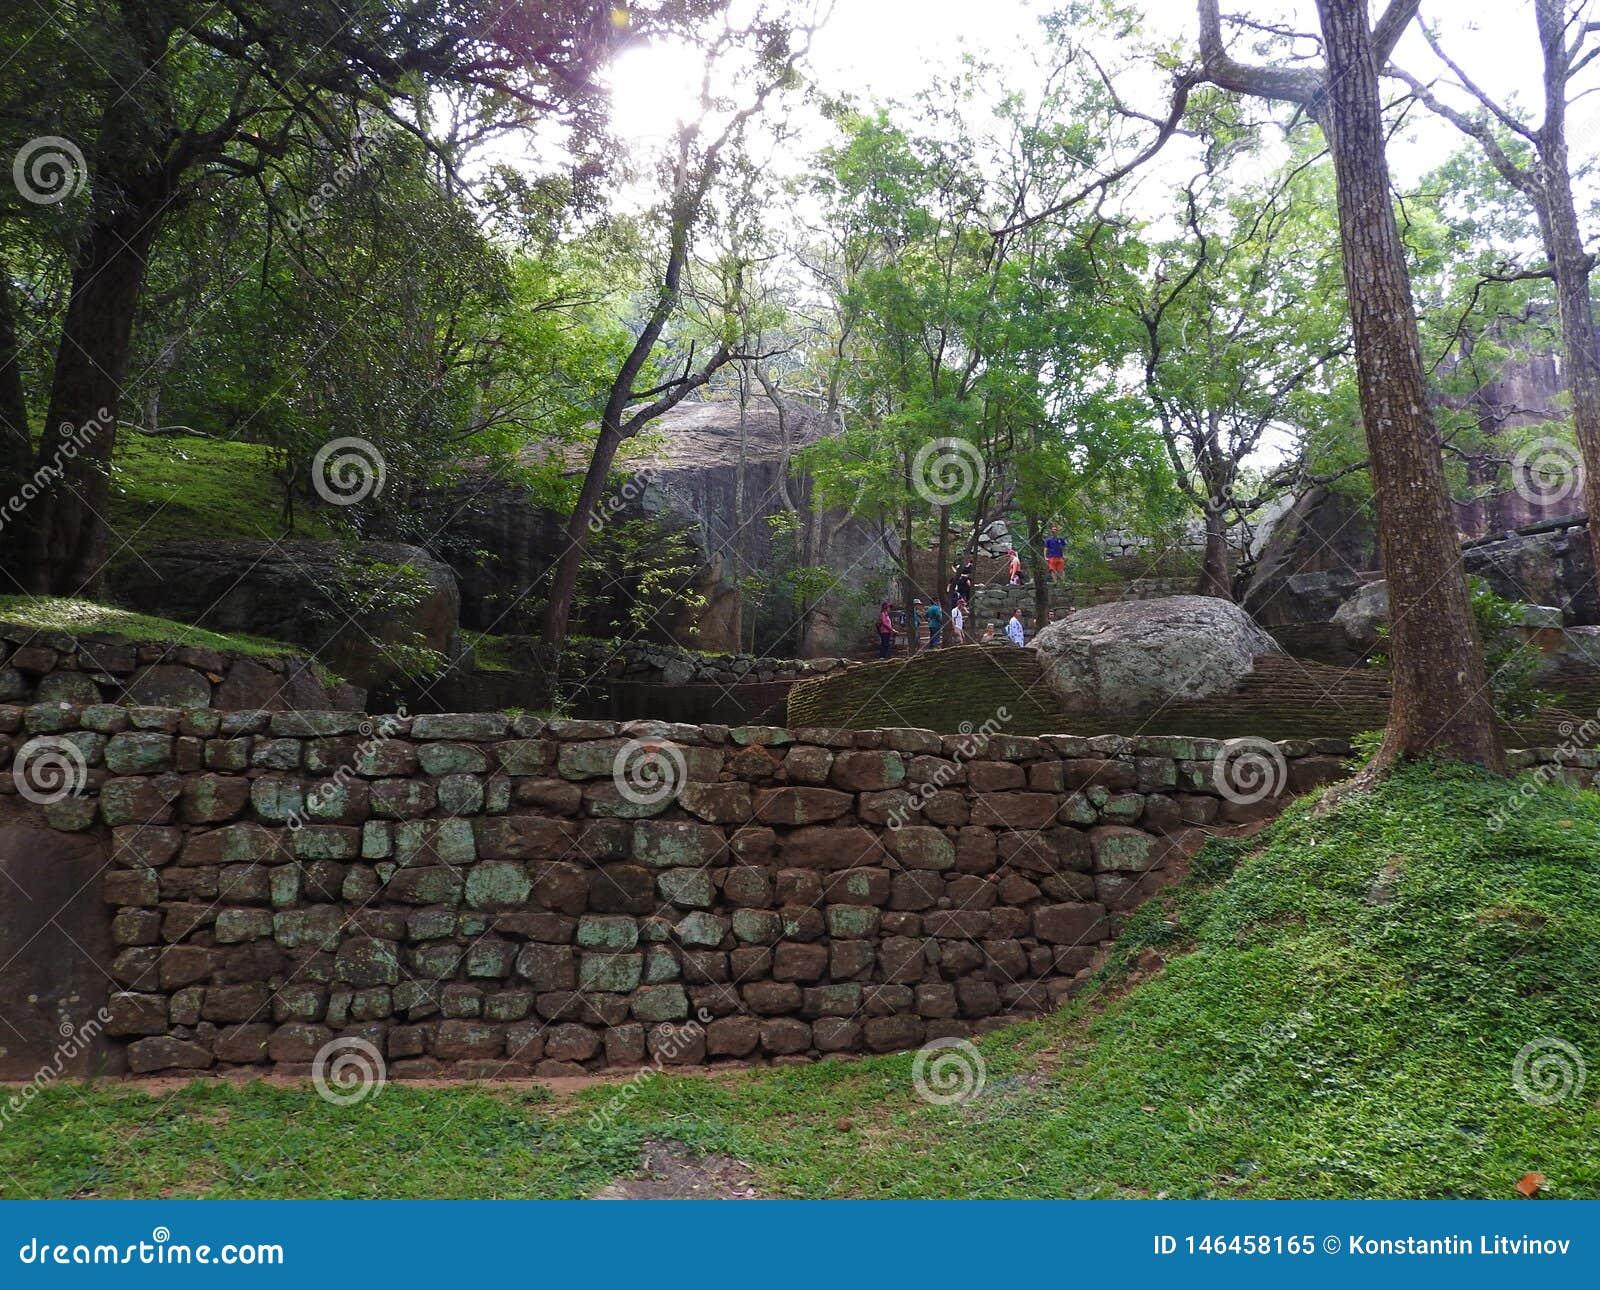 Ruins of the Royal Palace on top of lion rock, Sigiriya, Sri Lanka, UNESCO world heritage Site